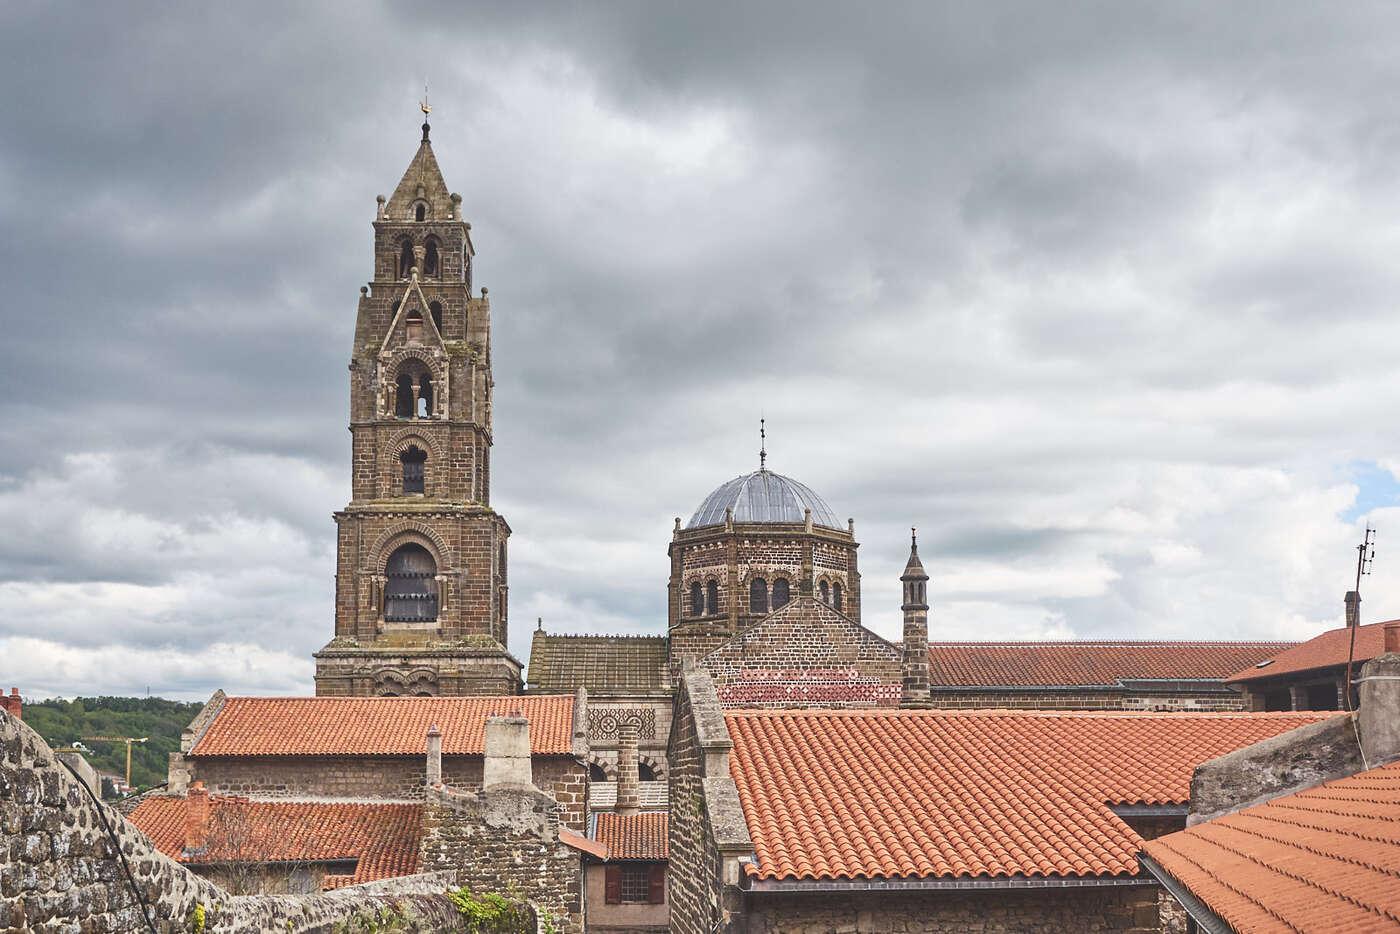 Cathédrale de Puy-en-Velay